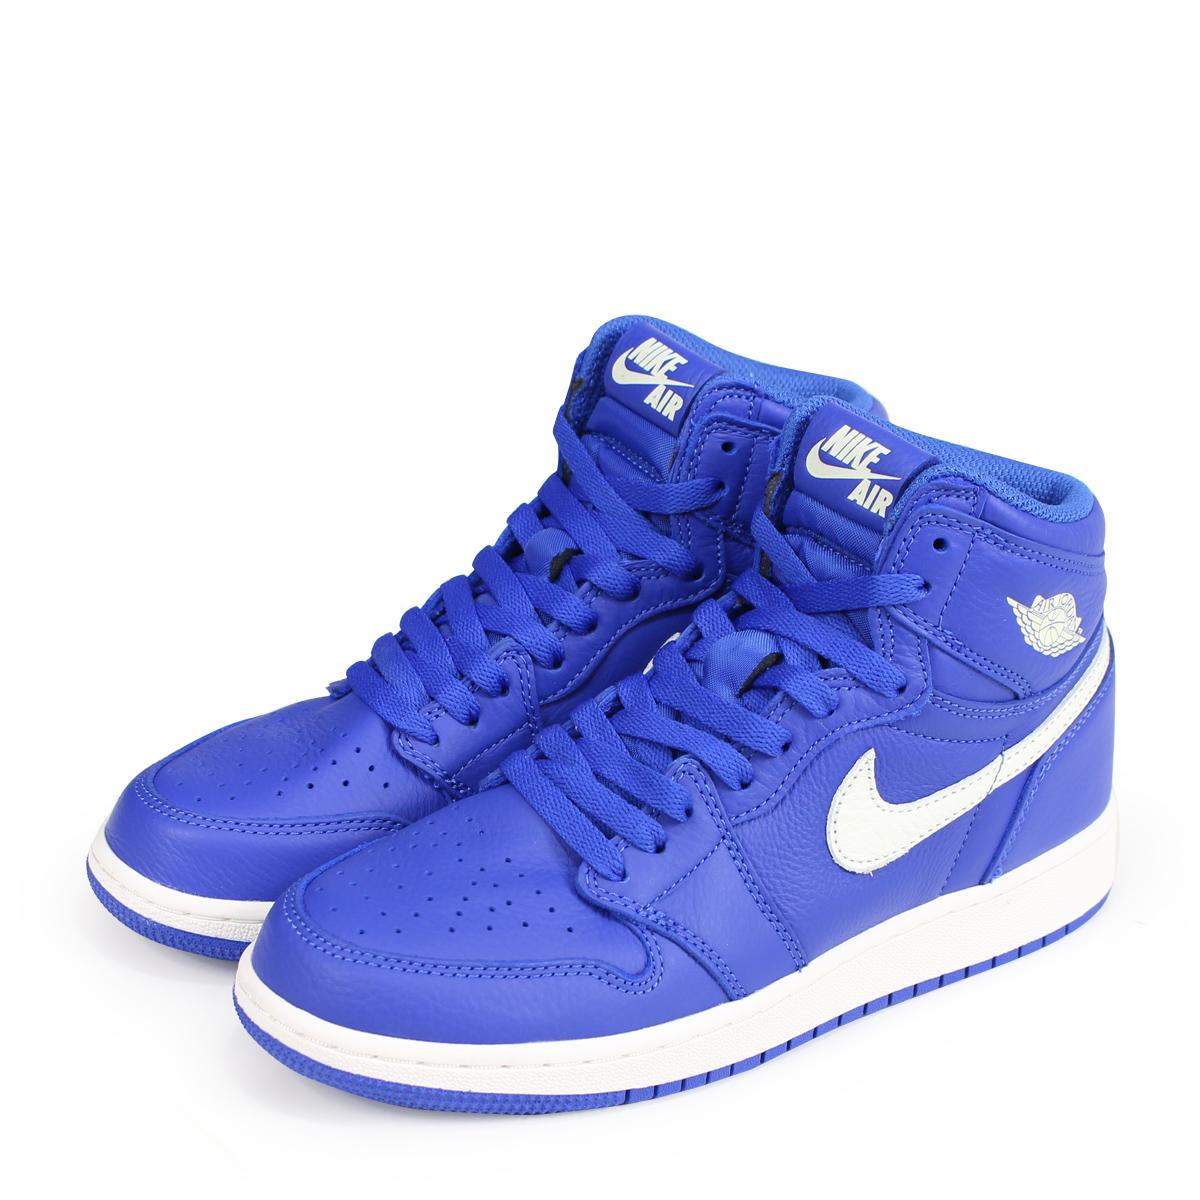 hot sale online 0b269 abec6 NIKE AIR JORDAN 1 RETRO HIGH OG BG Nike Air Jordan 1 nostalgic Haile Dis  sneakers 575,441-401 blue  load planned Shinnyu load in reservation product  8 18 ...